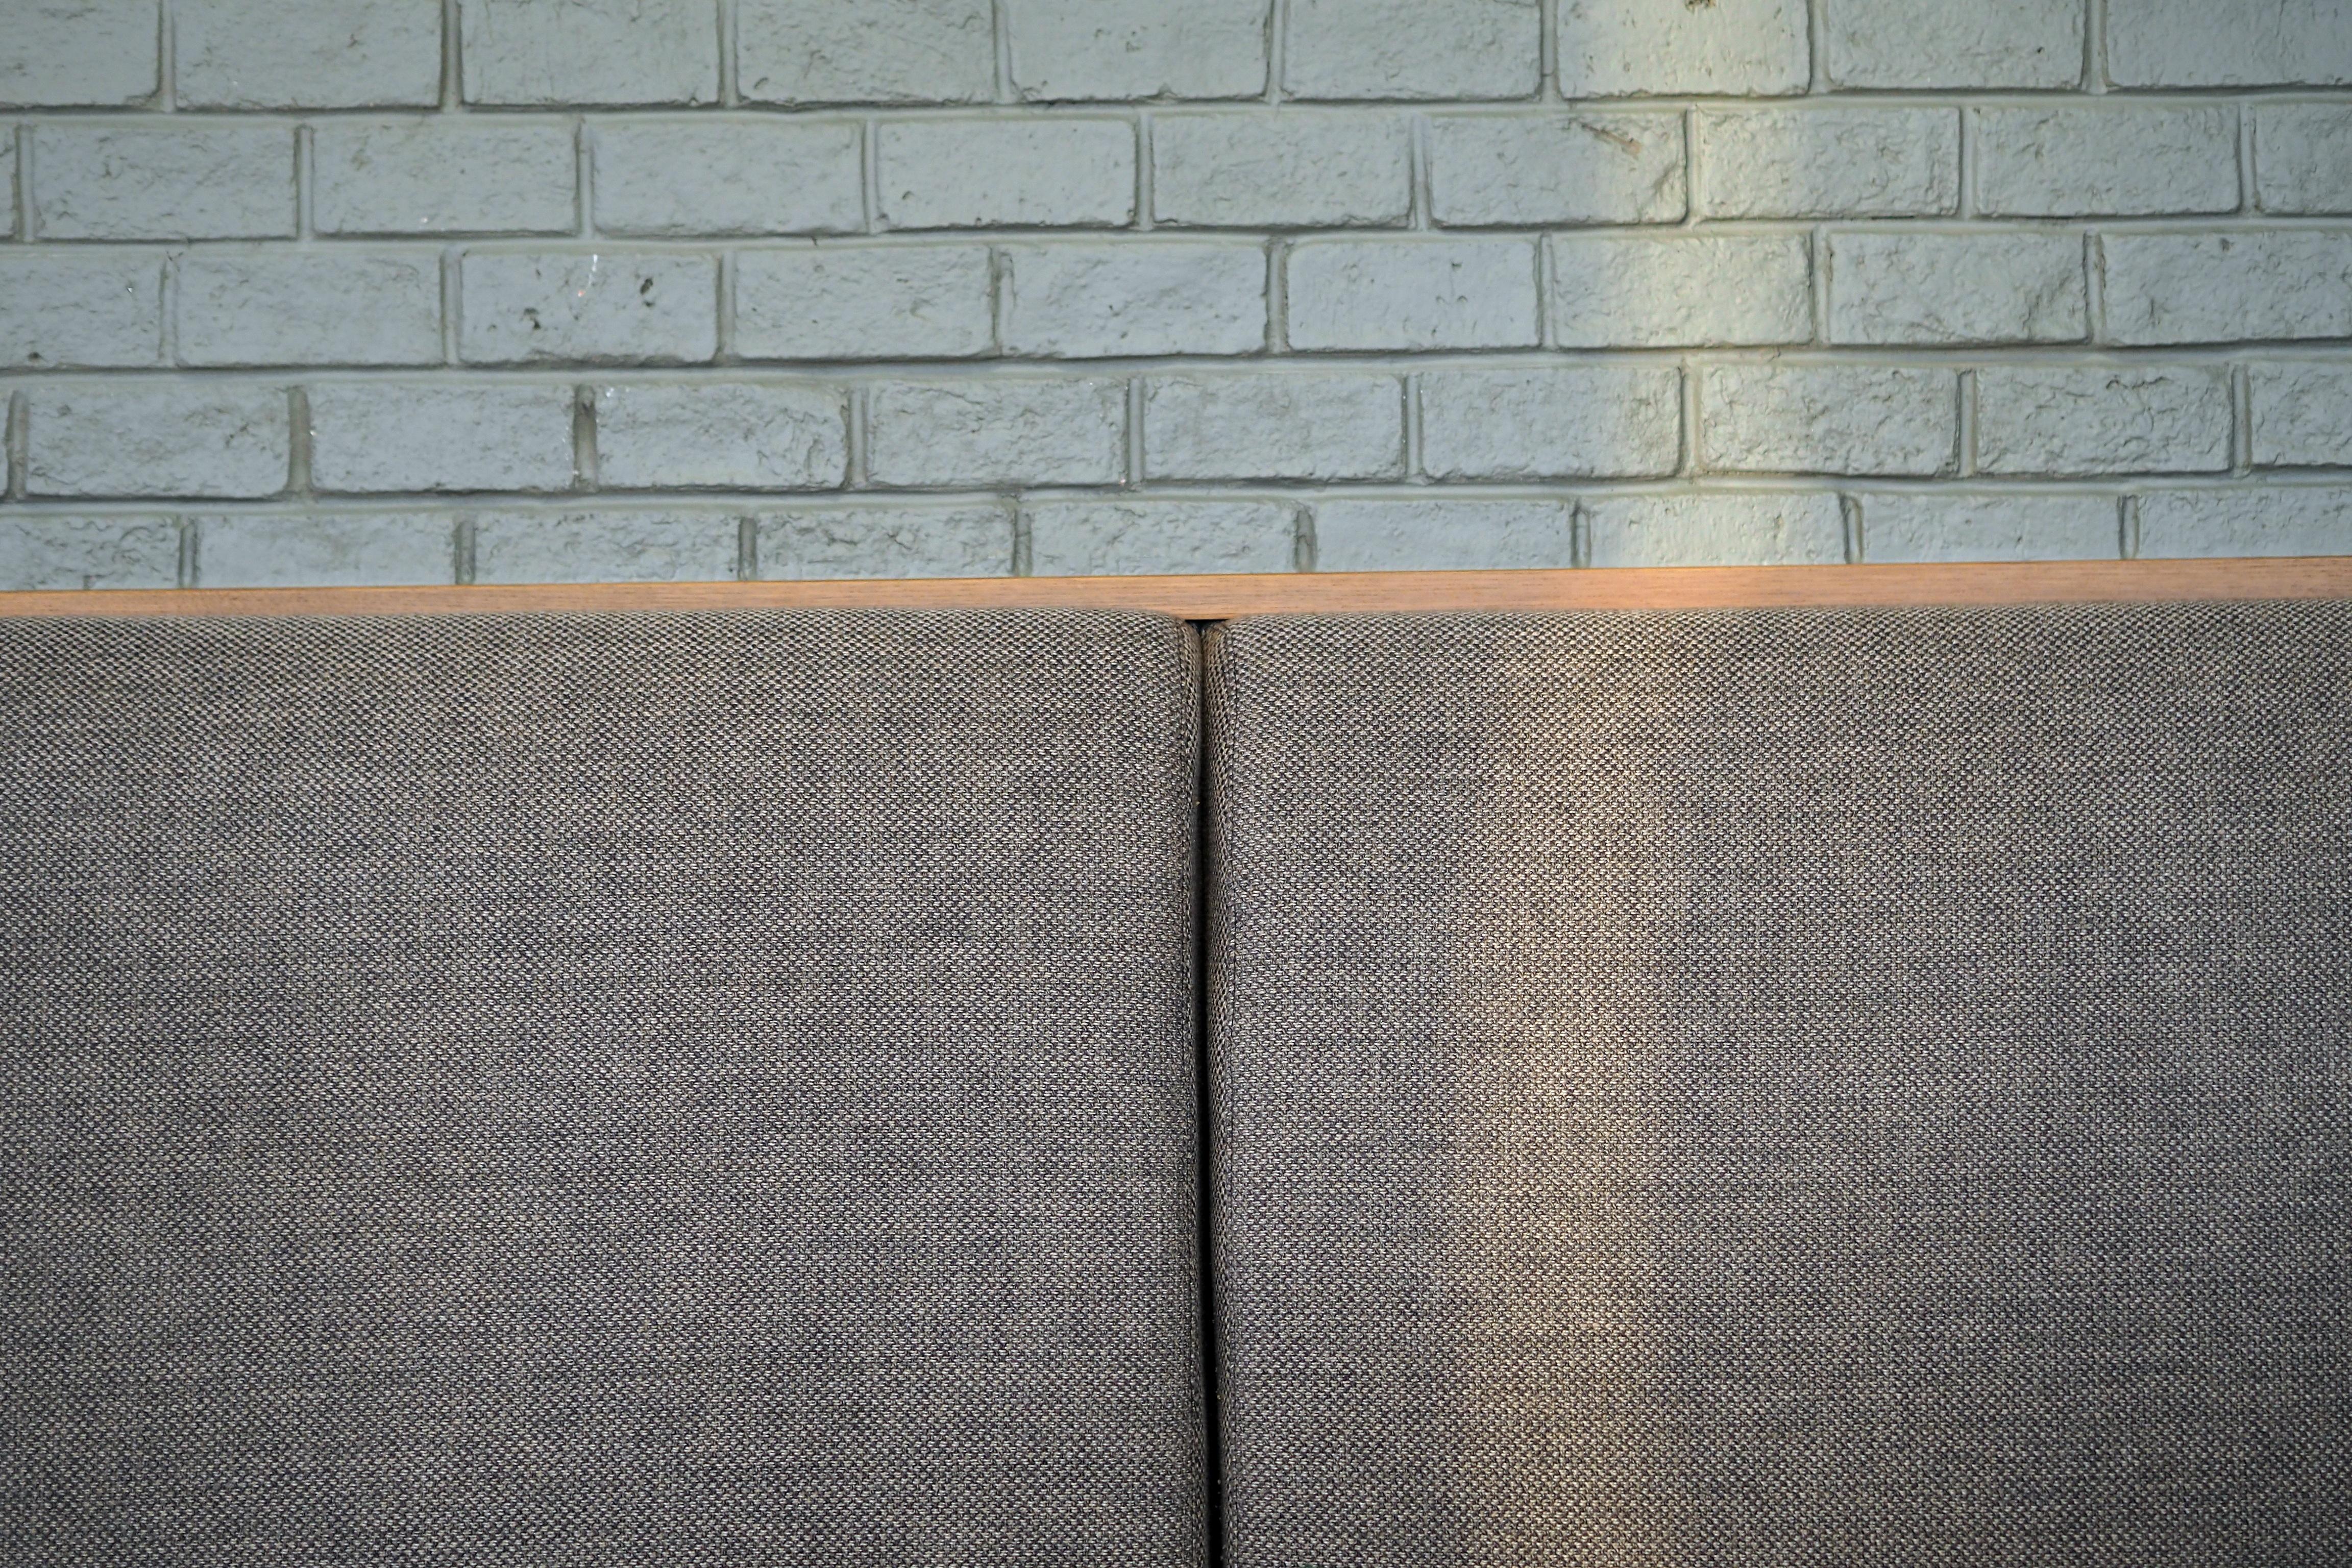 Coffee Shop Light Chair Floor Wall Tile Brick Material Fabric Interior Design Cushion Seats Flooring Window